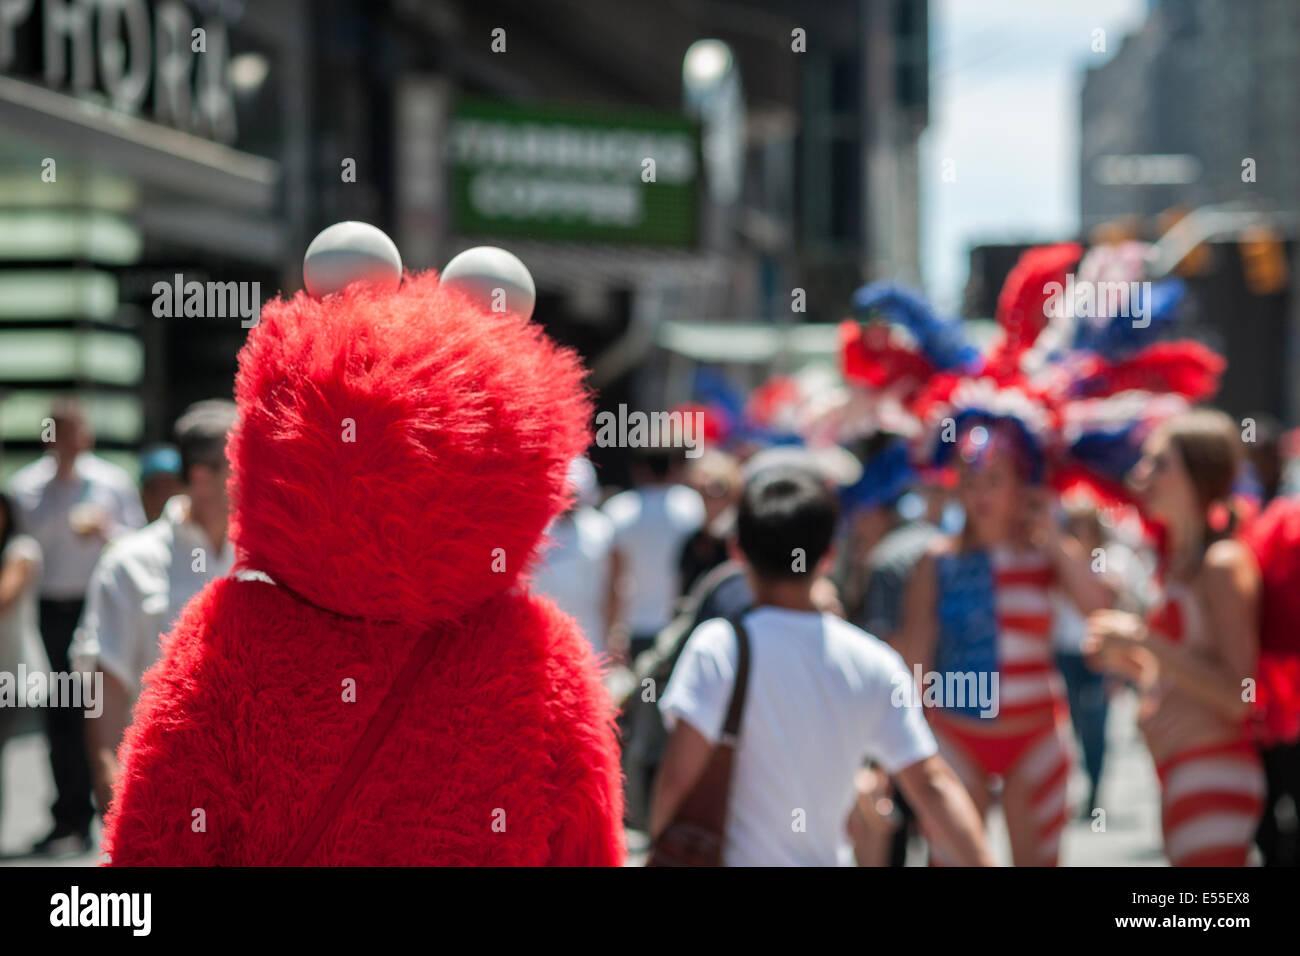 Elmo erbittet Touristen auf dem Times Square in New York auf Freitag, 18. Juli 2014. Stockbild